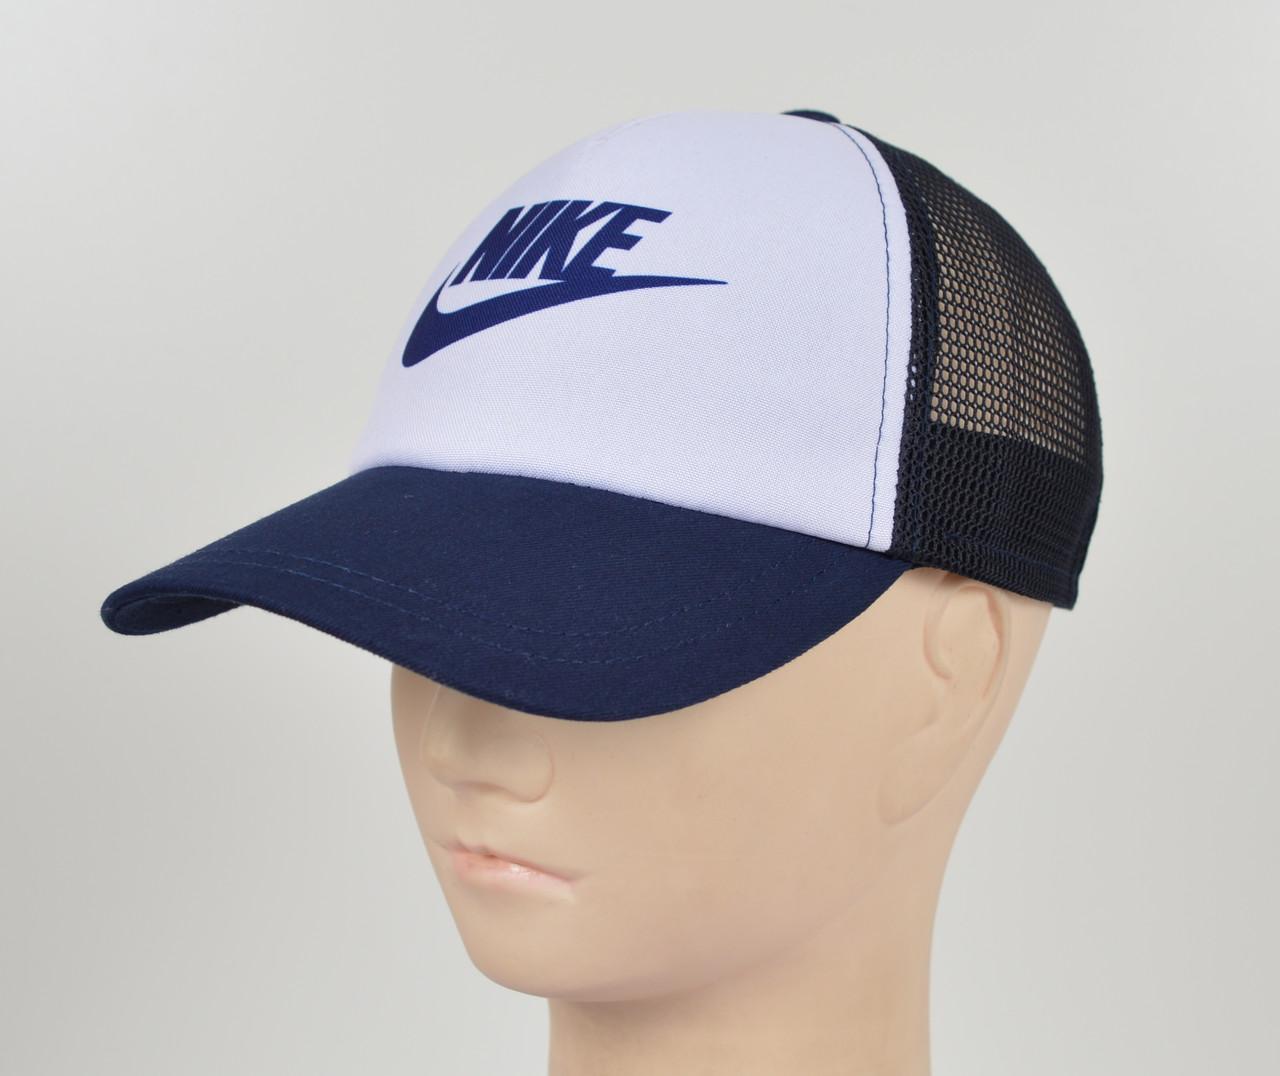 Бейсболка 5 кл сетка Nike синий